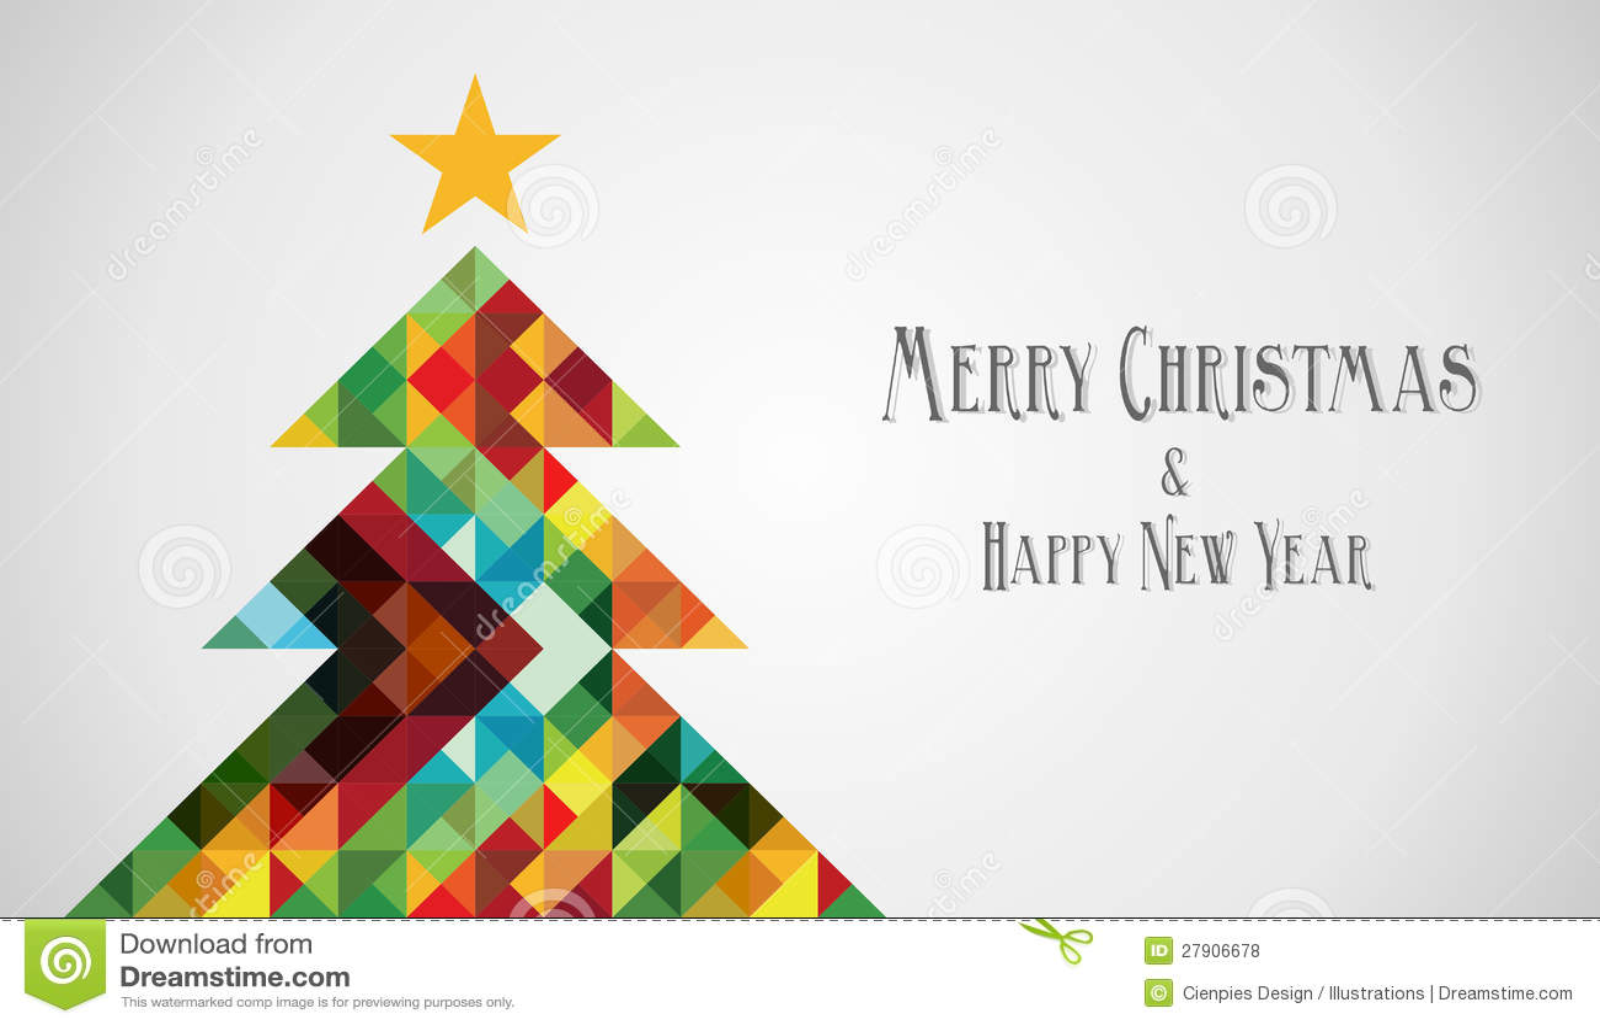 diversity mosaic arty christmas tree royalty free stock photos